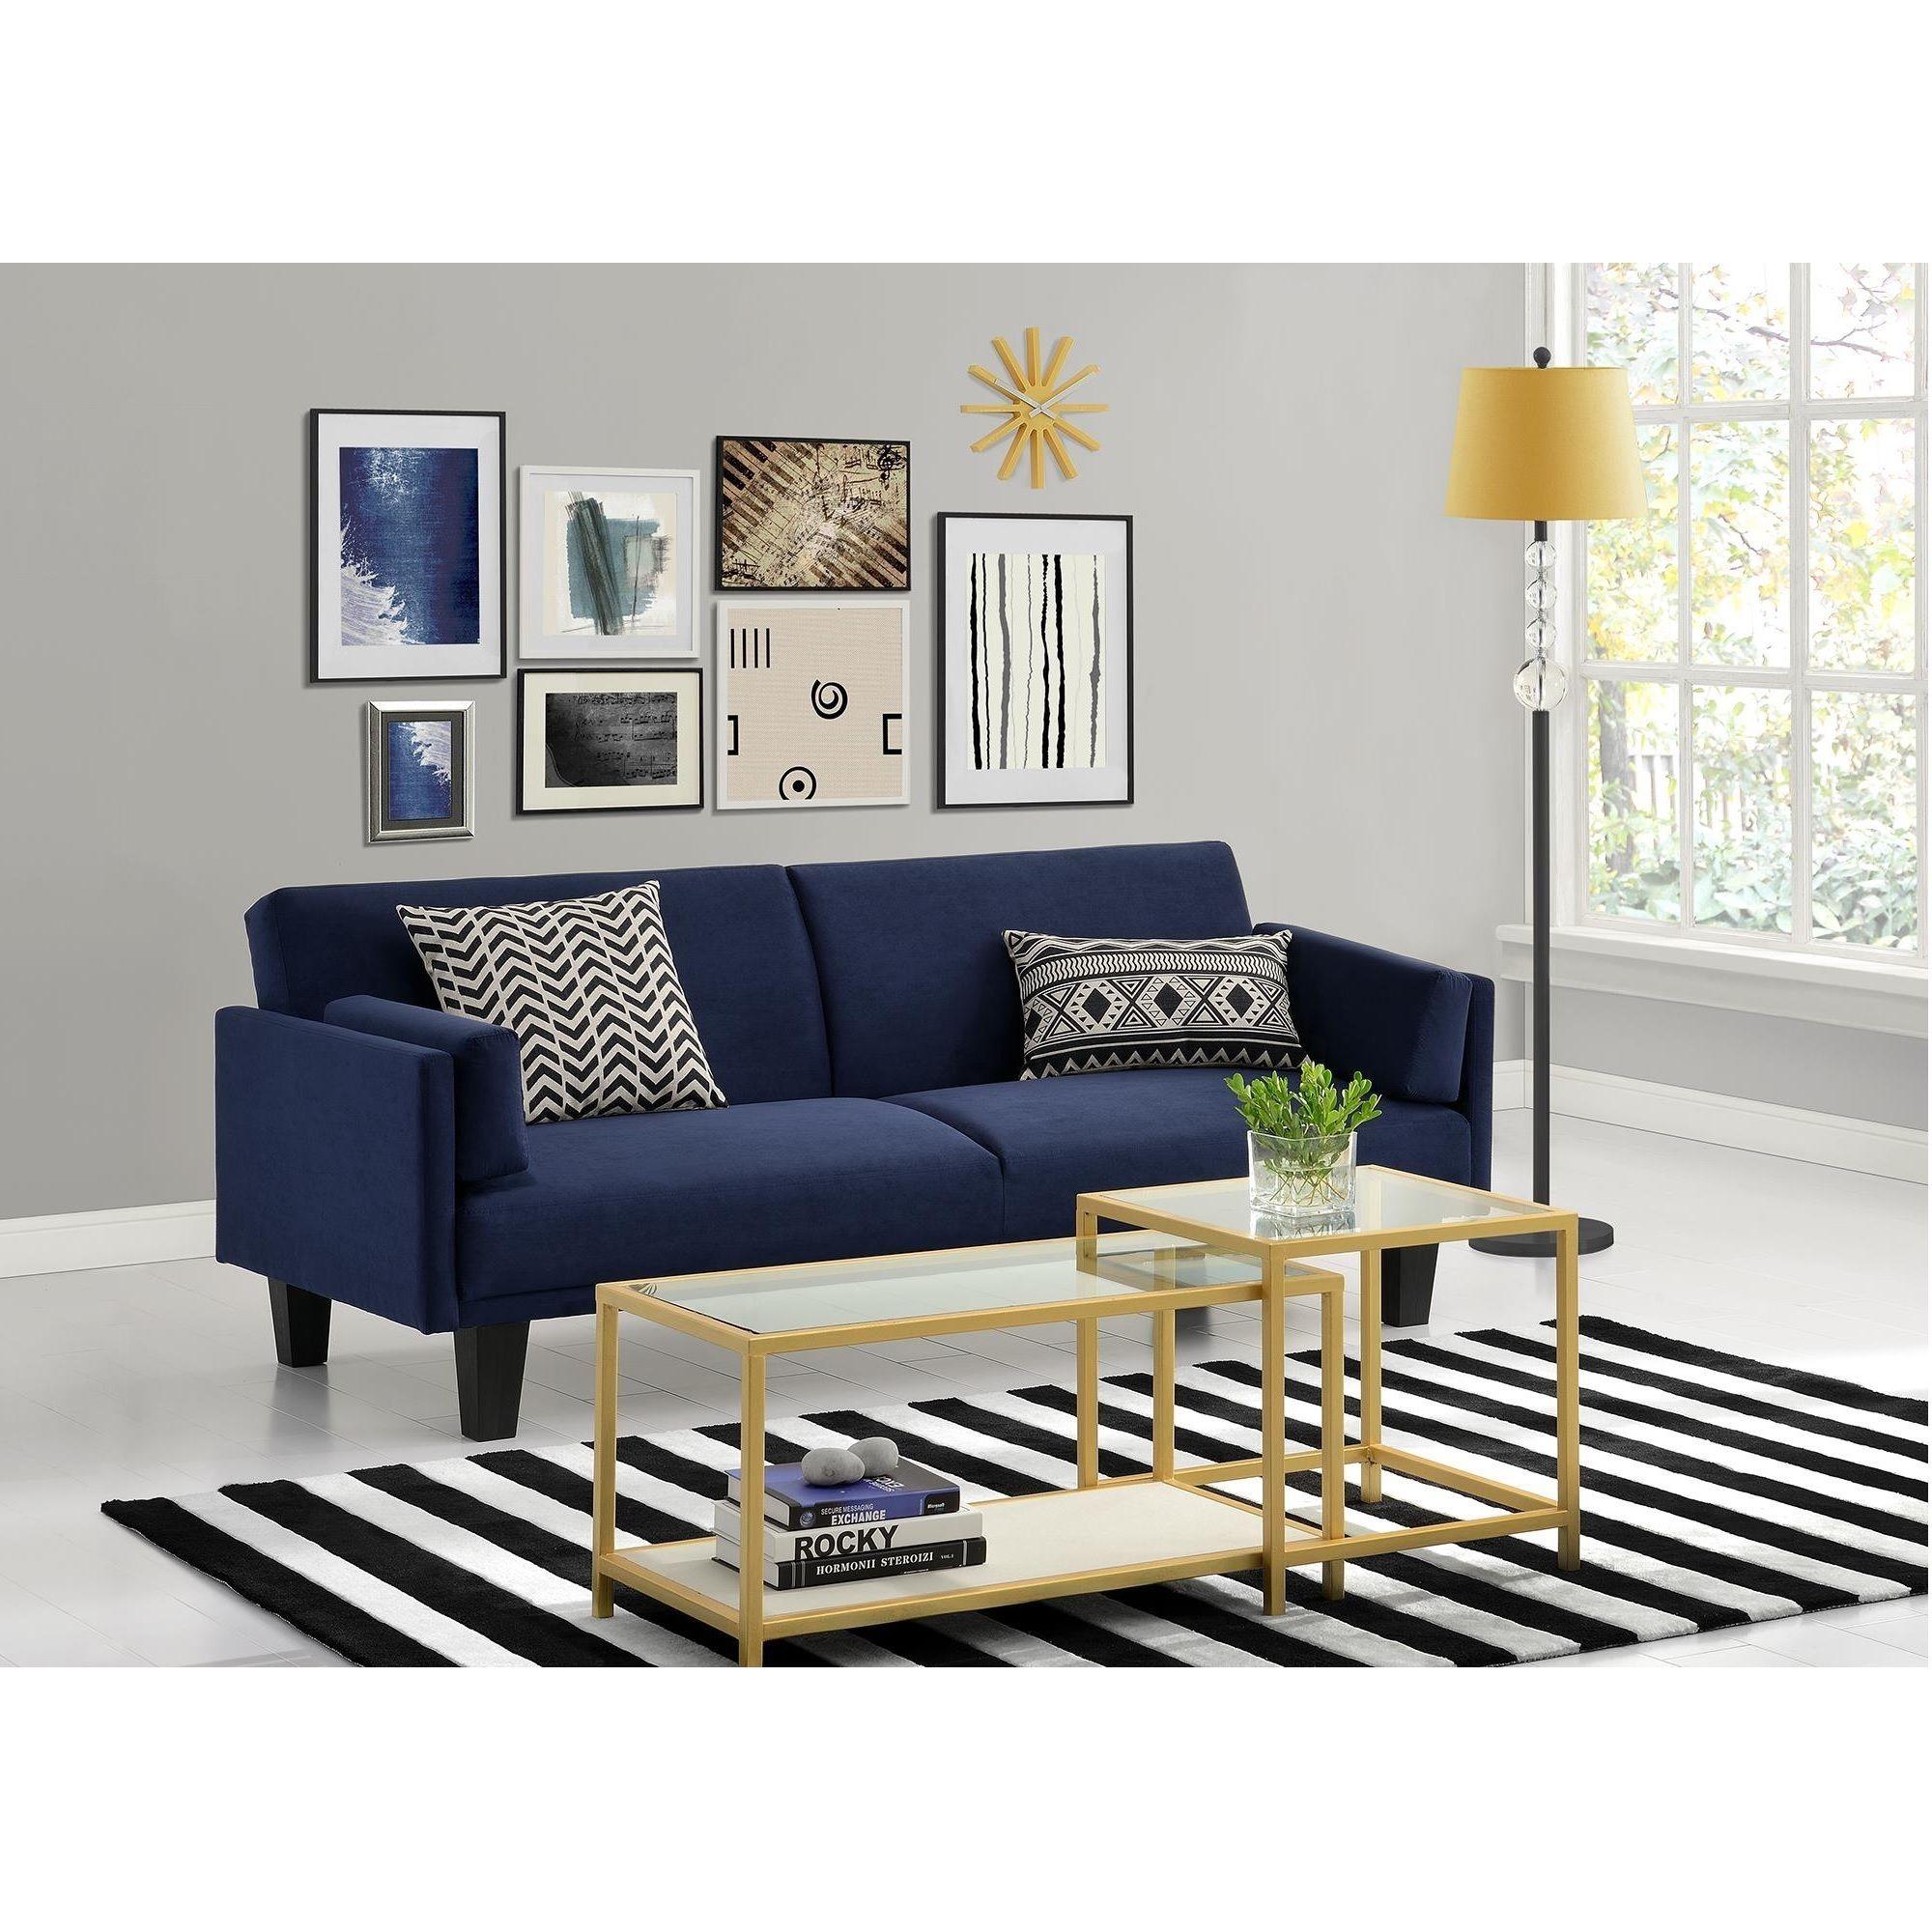 Overstock Com Online Shopping Bedding Furniture Electronics Jewelry Clothing More Minimalist Living Room Elegant Sofa Bed Futon Sofa